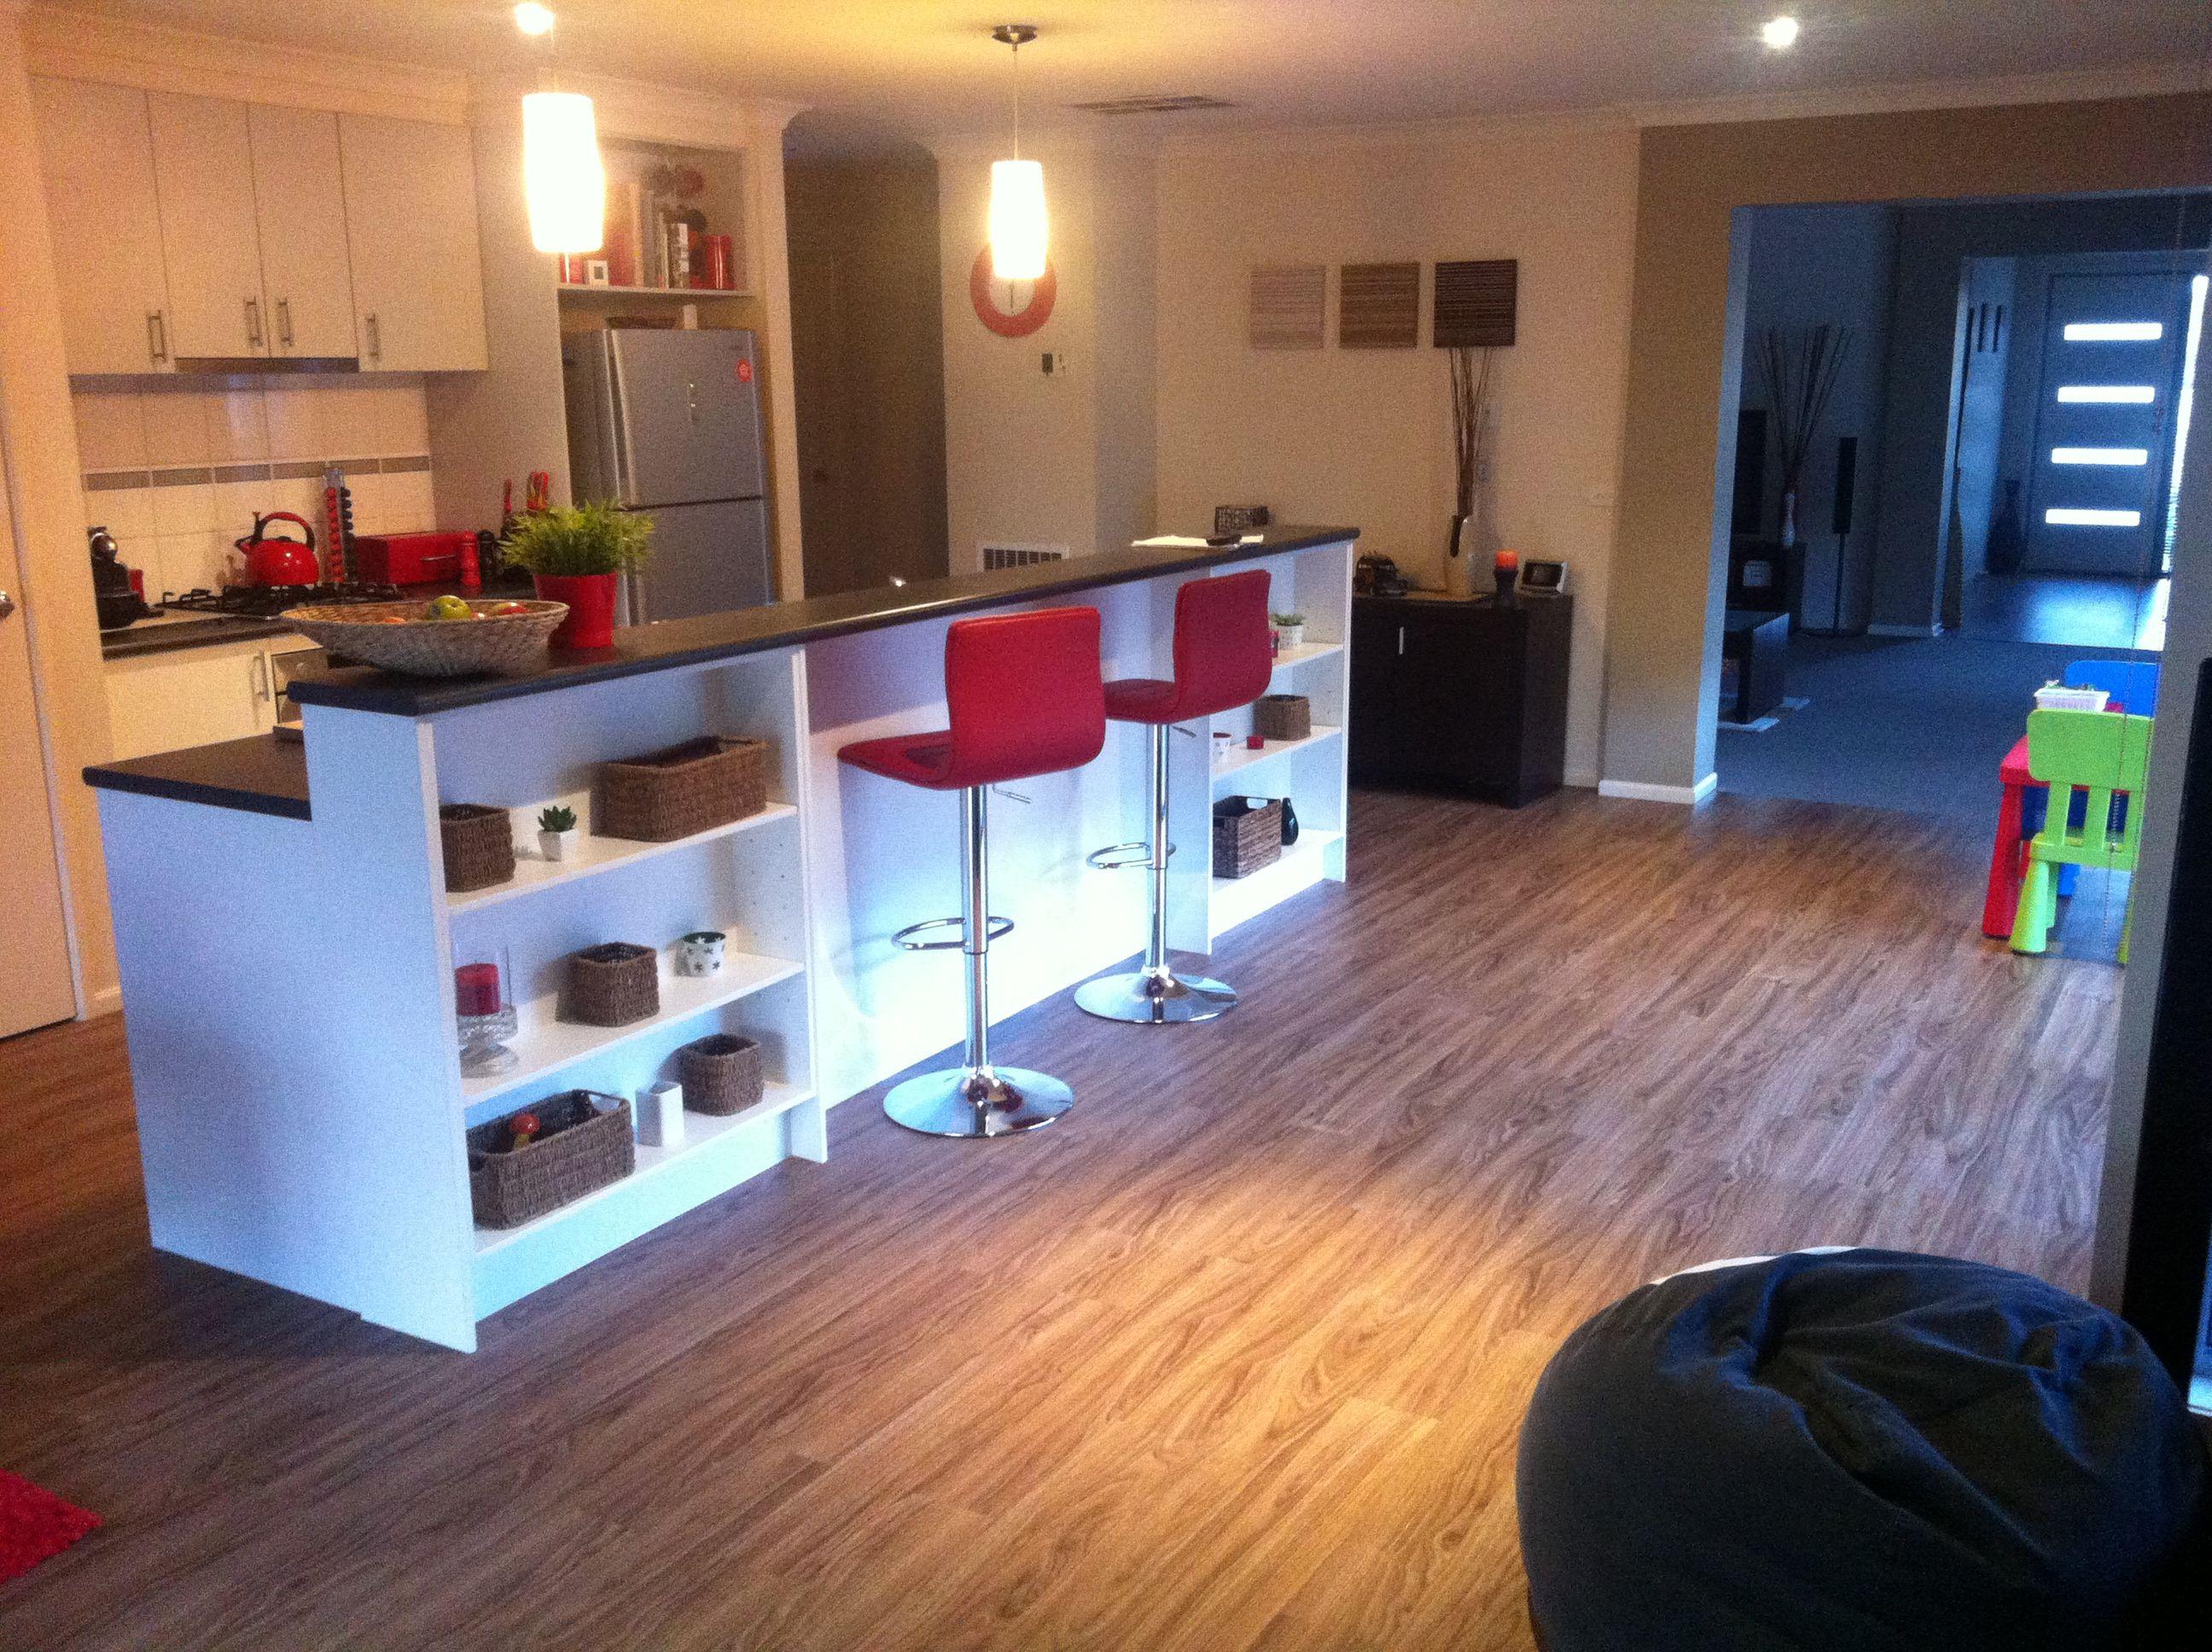 My new floorboards novalis vinyl plank flooring laid directly my new floorboards novalis vinyl plank flooring laid directly over existing floor tile dailygadgetfo Choice Image